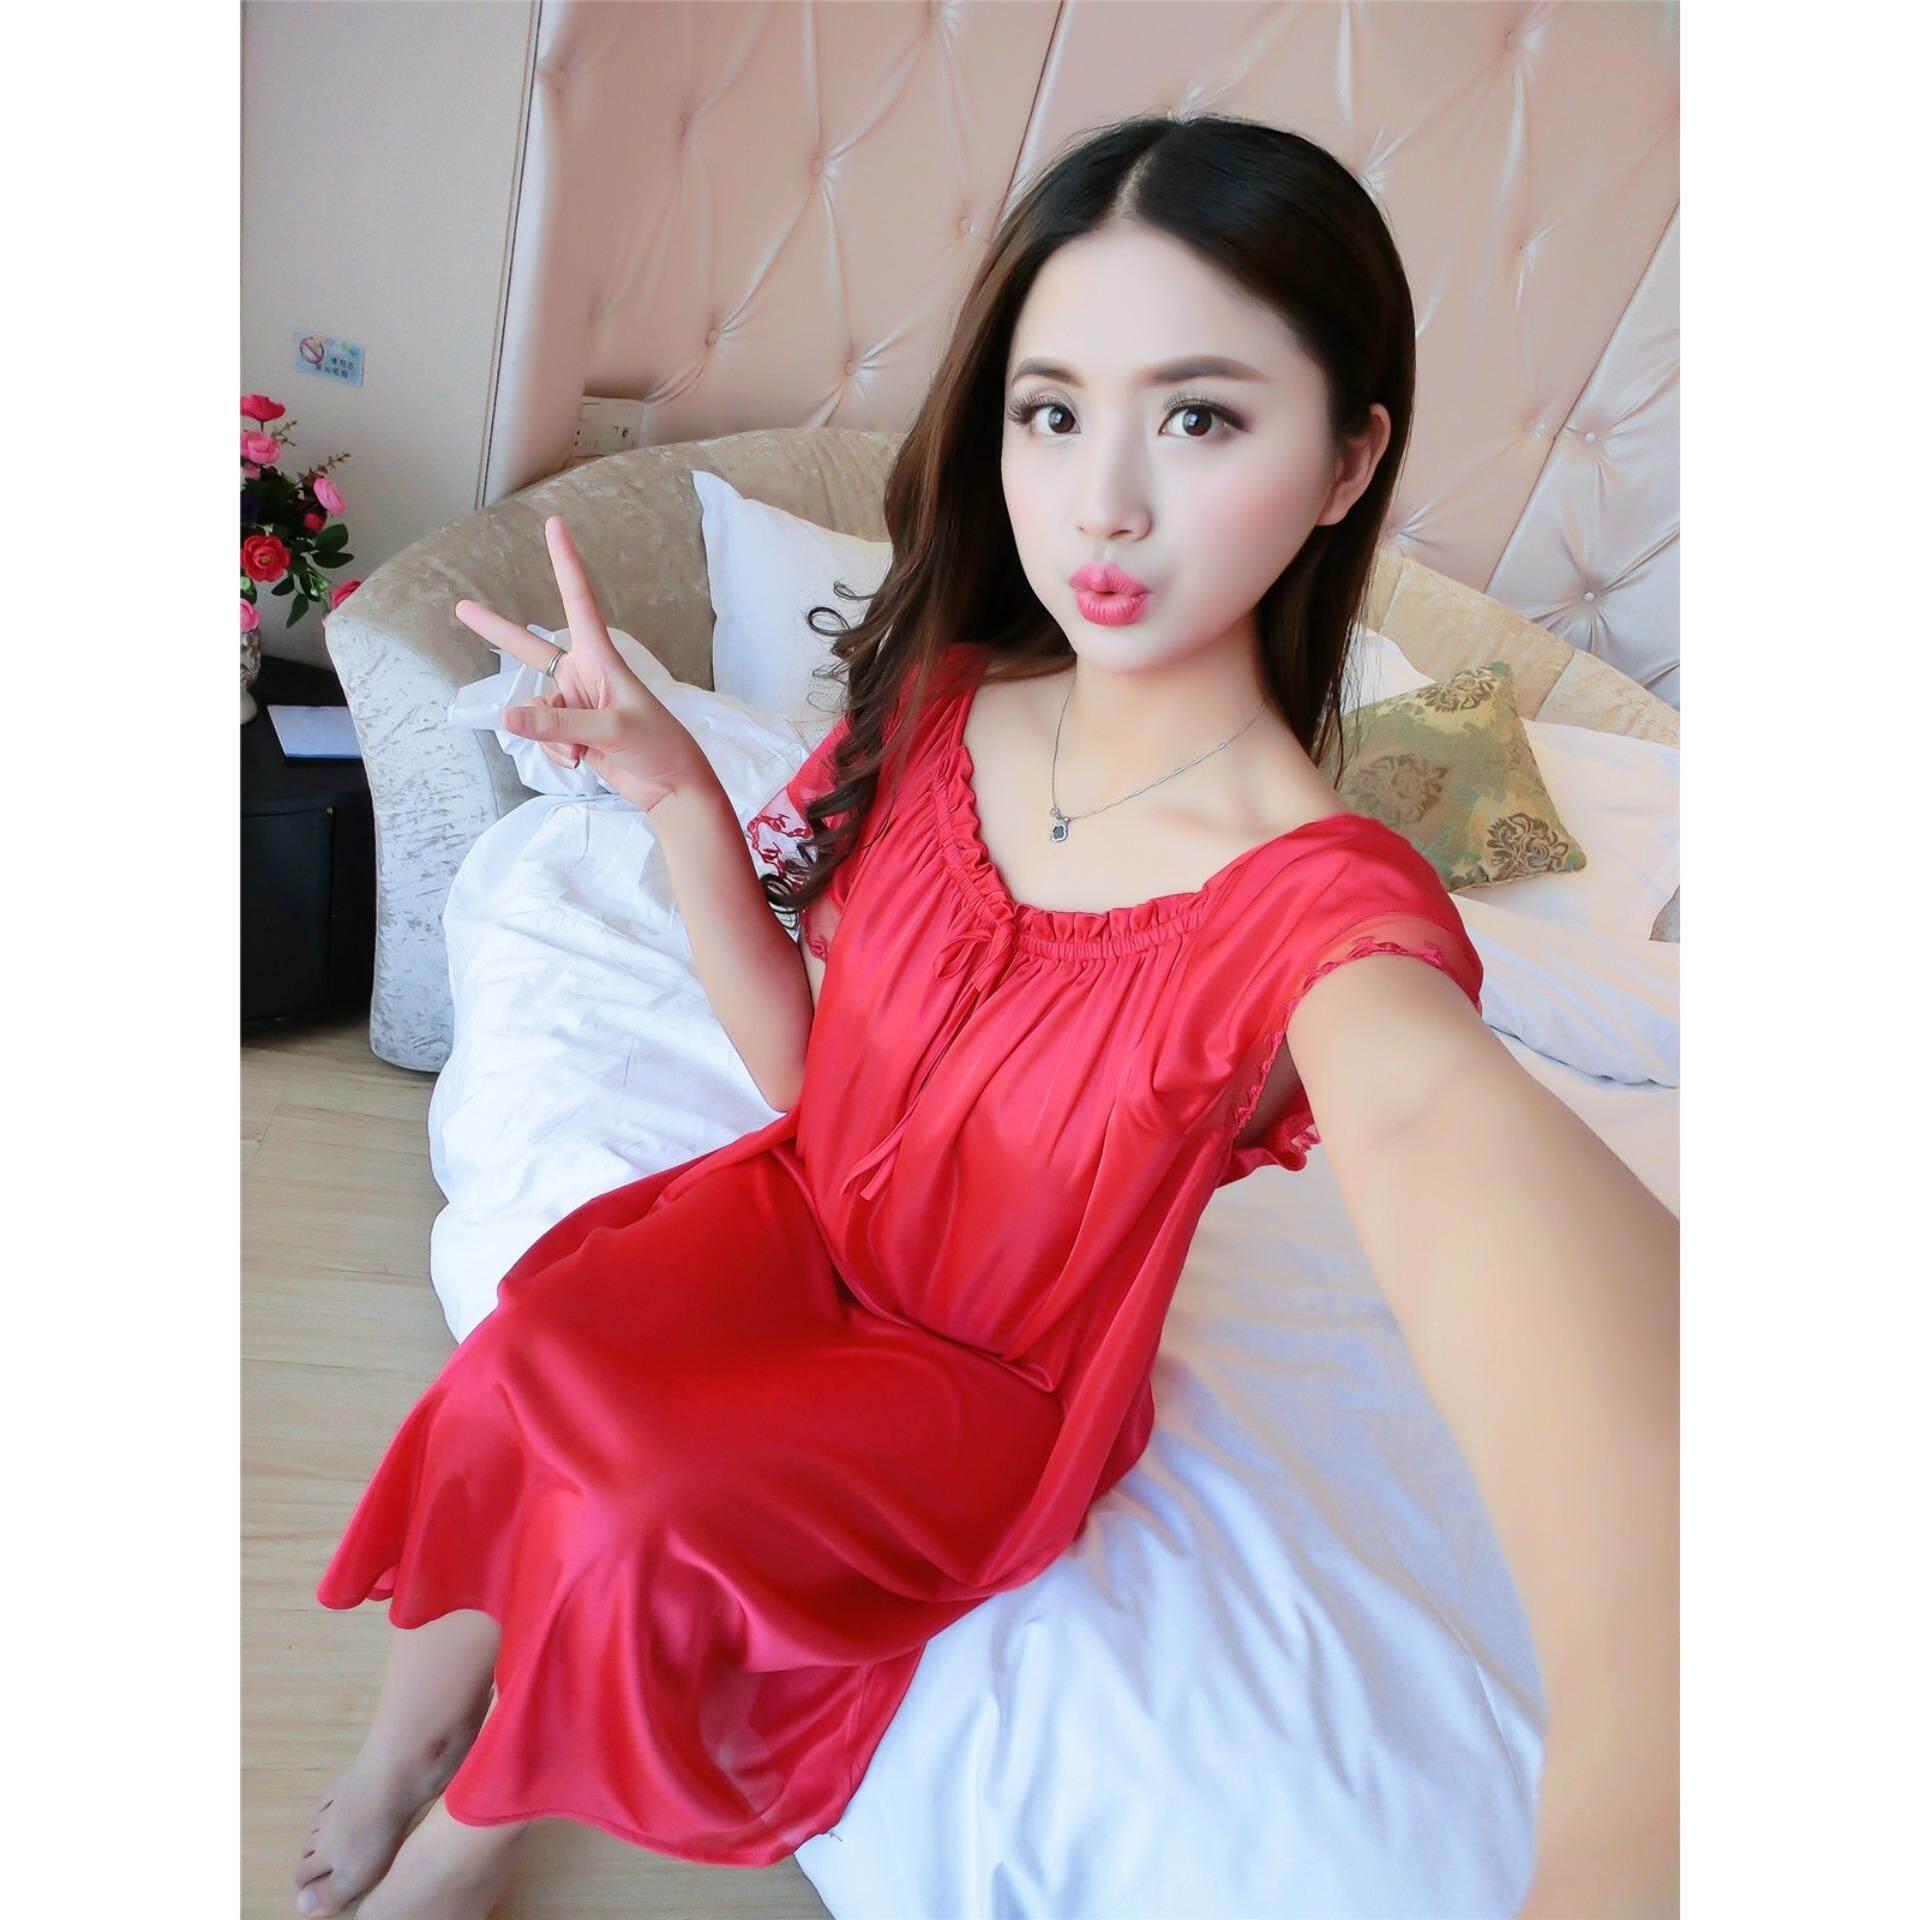 66f73e4b2 Bolster Store Ladies Women Sleepwear Sexy Lingerie Pajamas Long ...